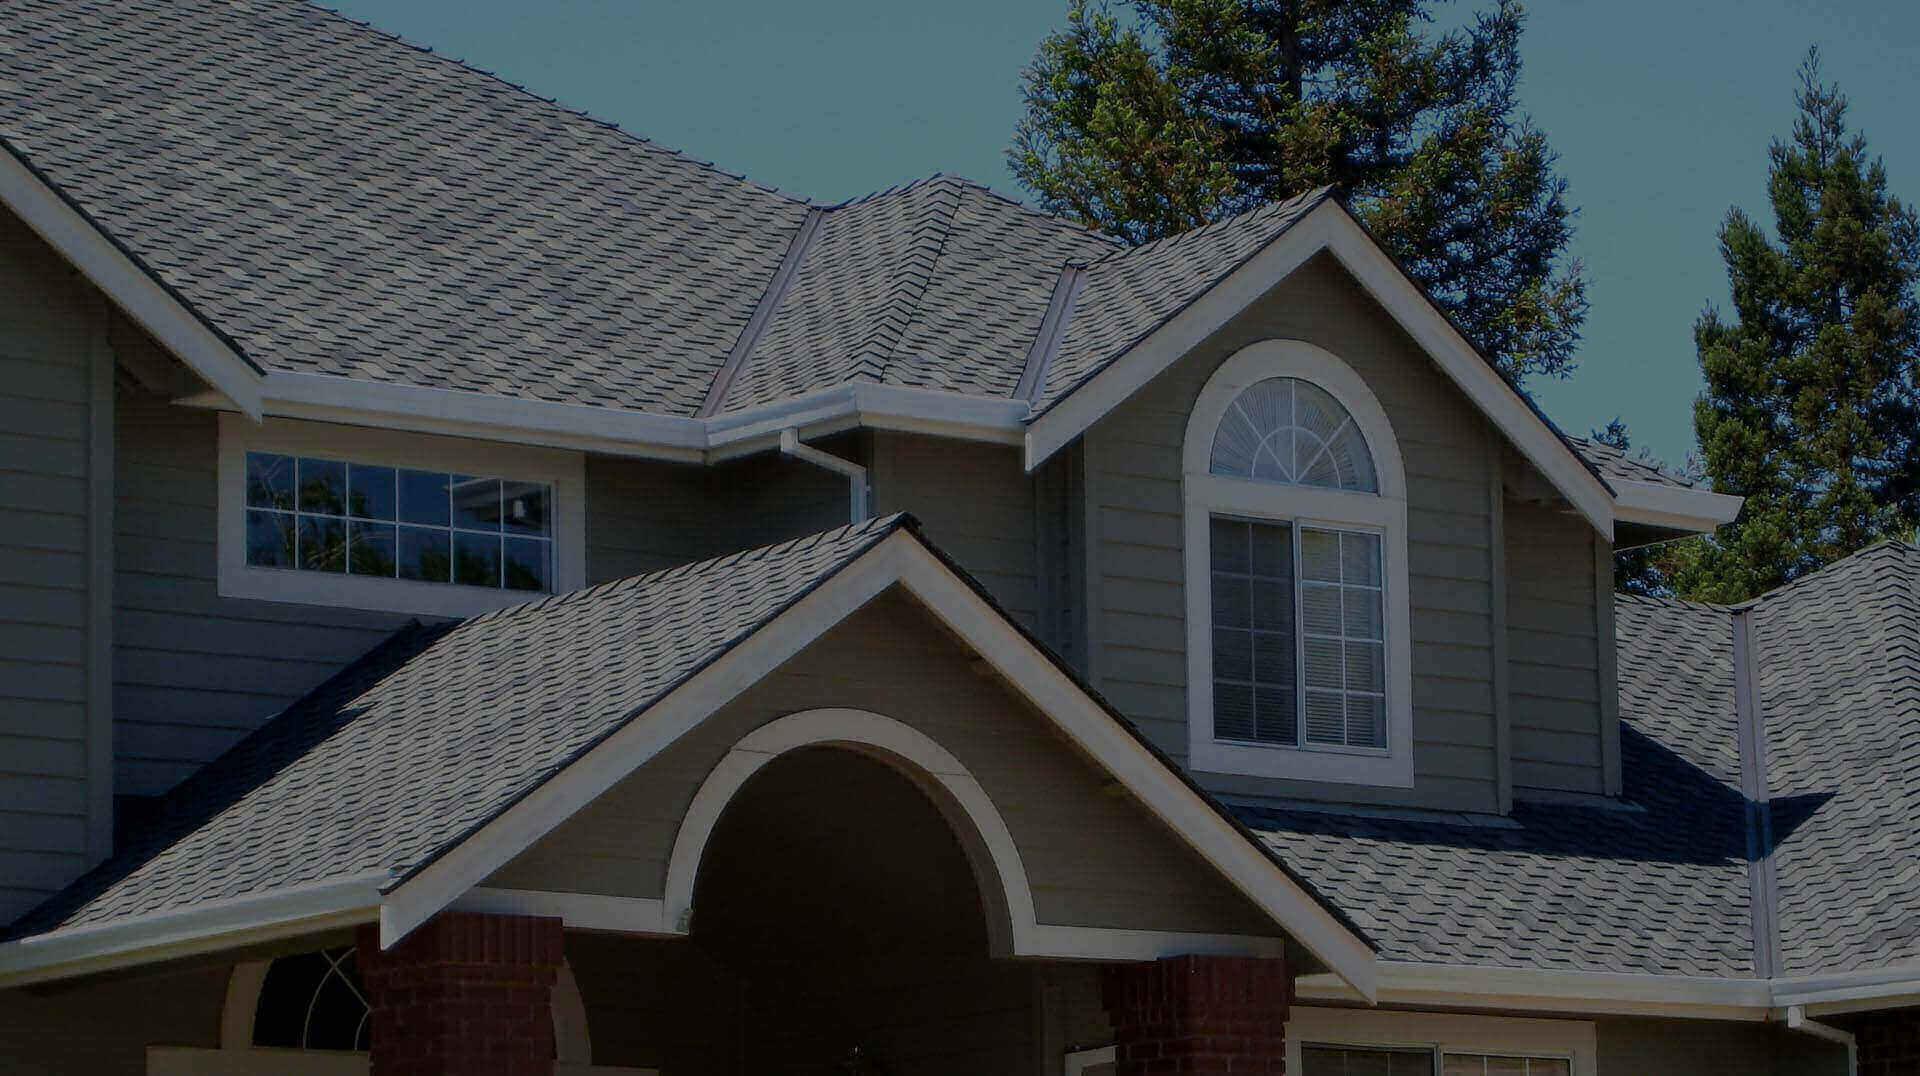 9 Summer Roof Maintenance Tips